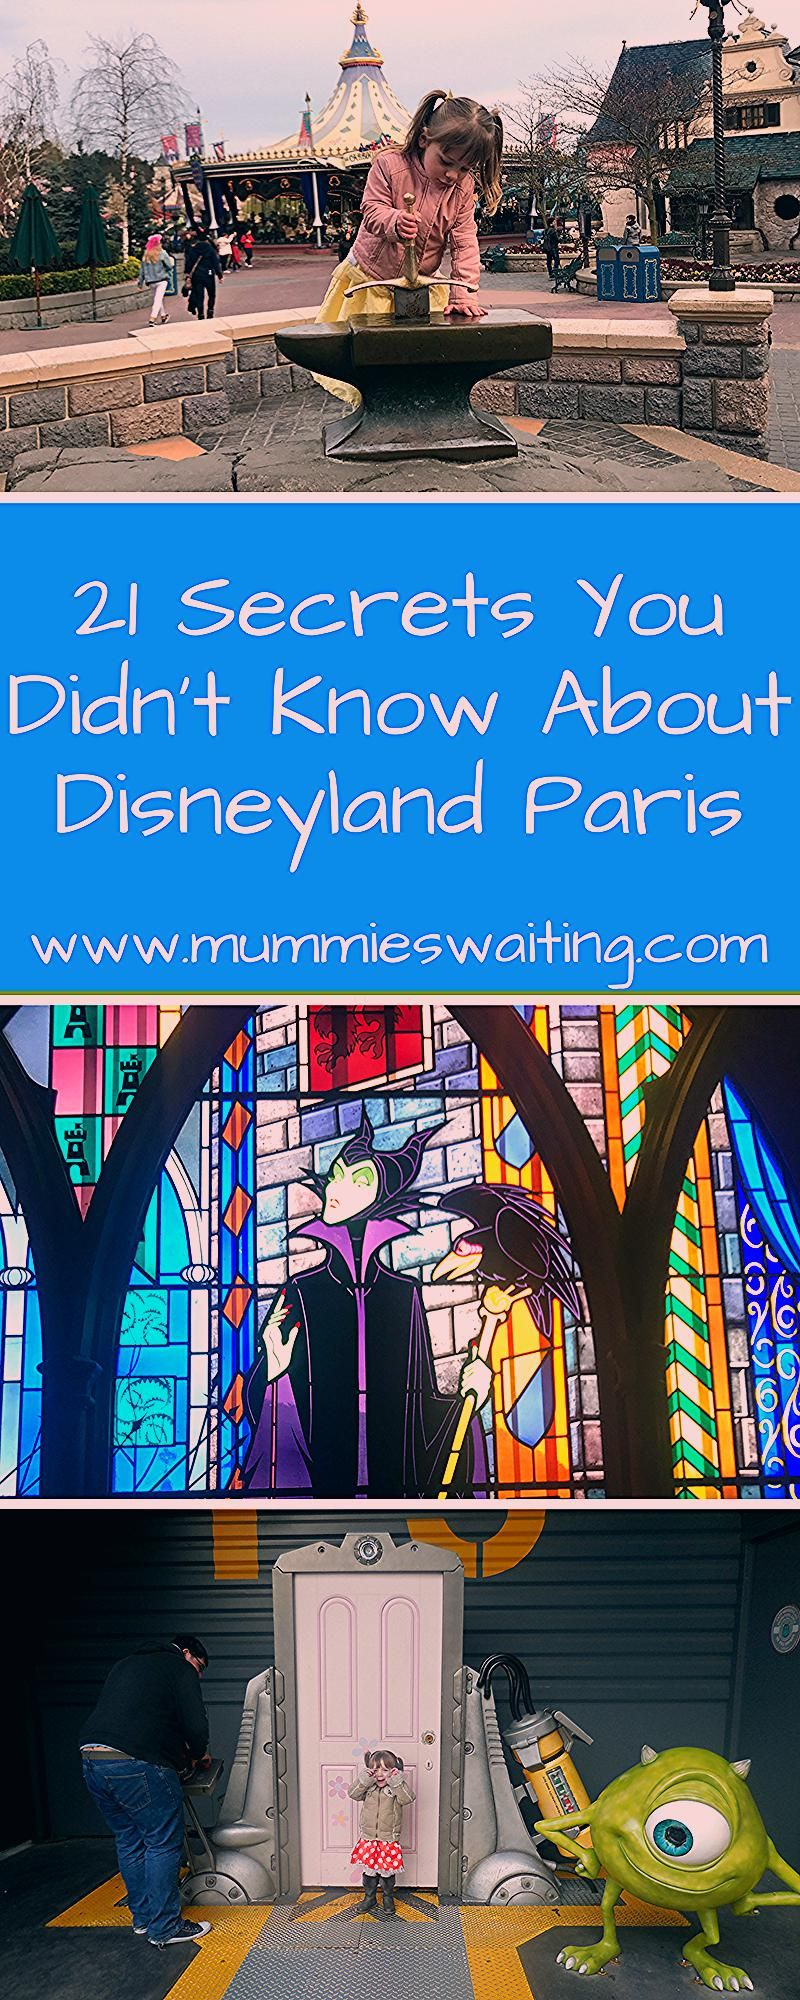 Photo of 21 Secrets You Didn't Know About Disneyland Paris | Disneyland Paris Scavenger Hunt